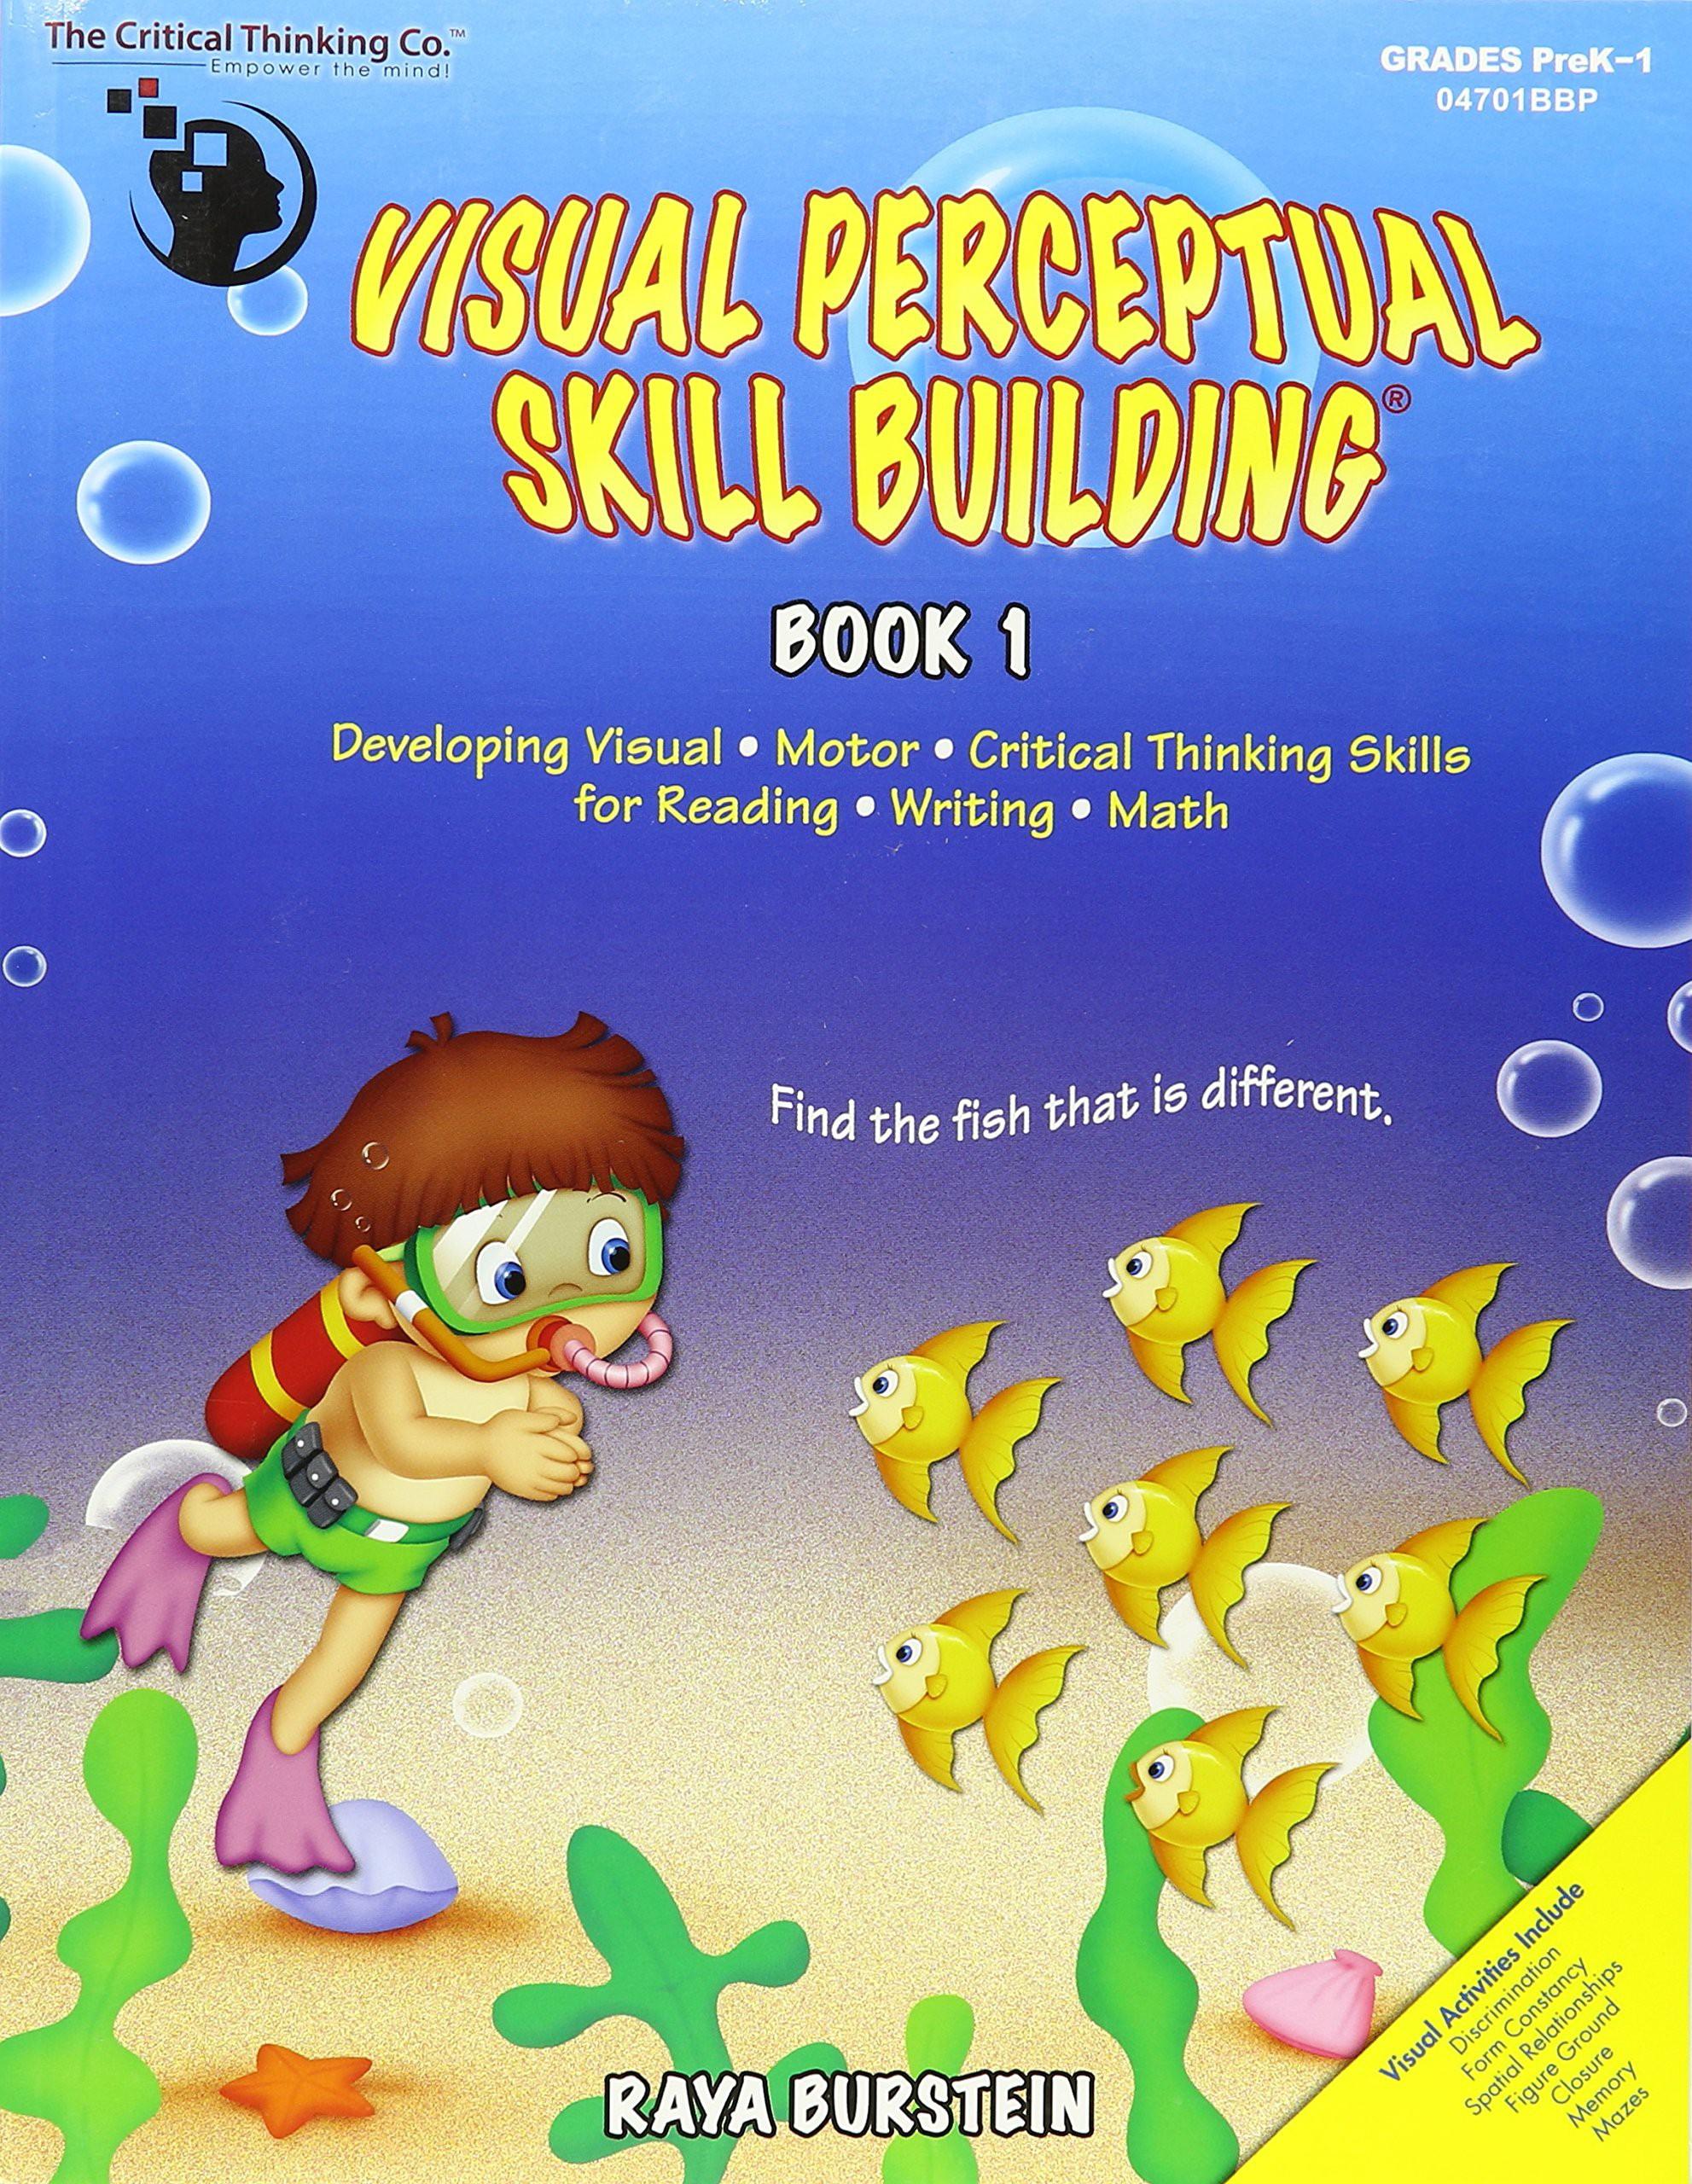 Visual Perceptual Skill Building, Book 1 - The Critical Thinking Company